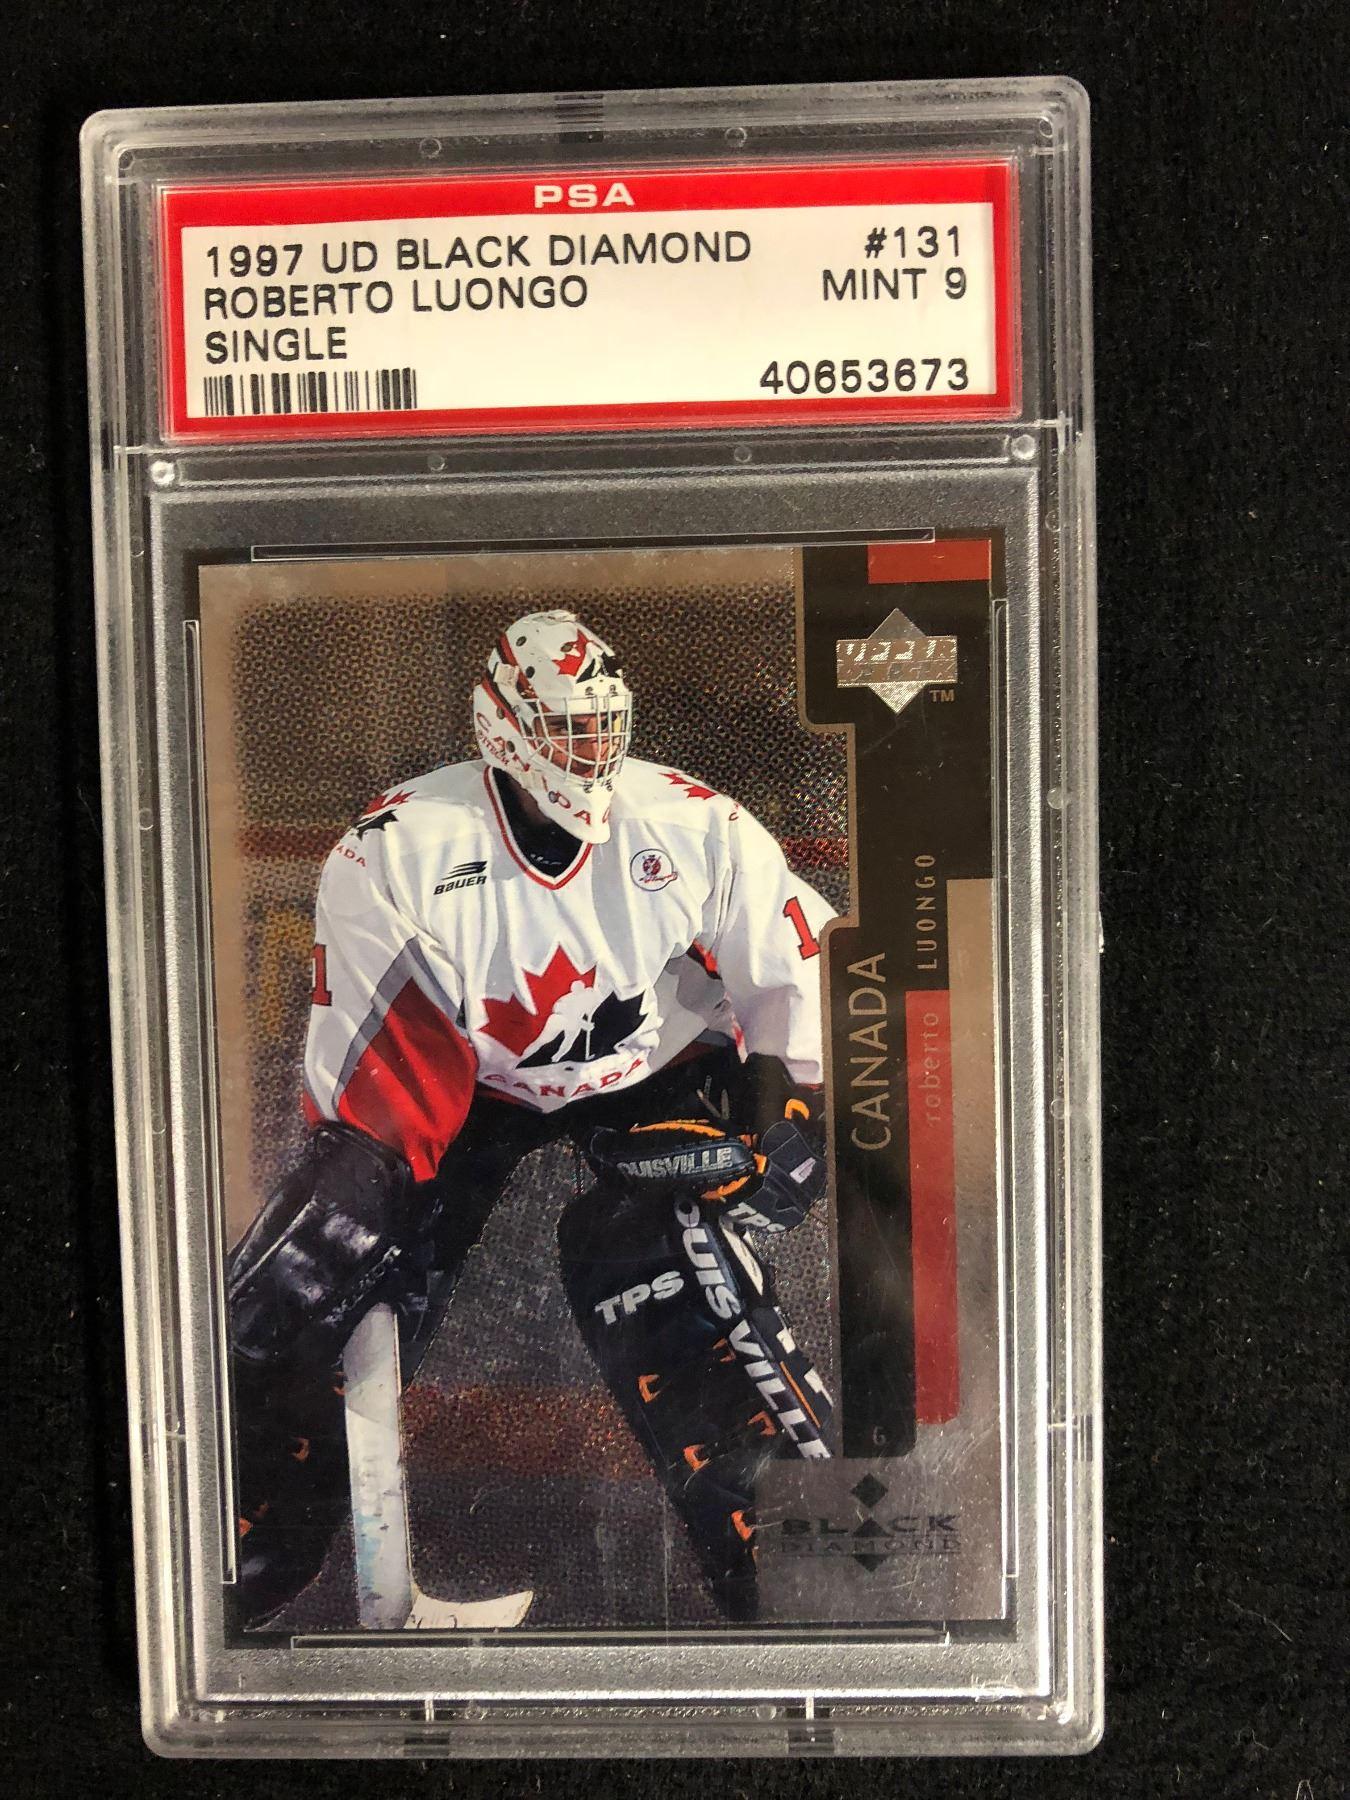 1997 Ud Black Diamond Roberto Luongo Single 131 Mint 9 Psa Graded